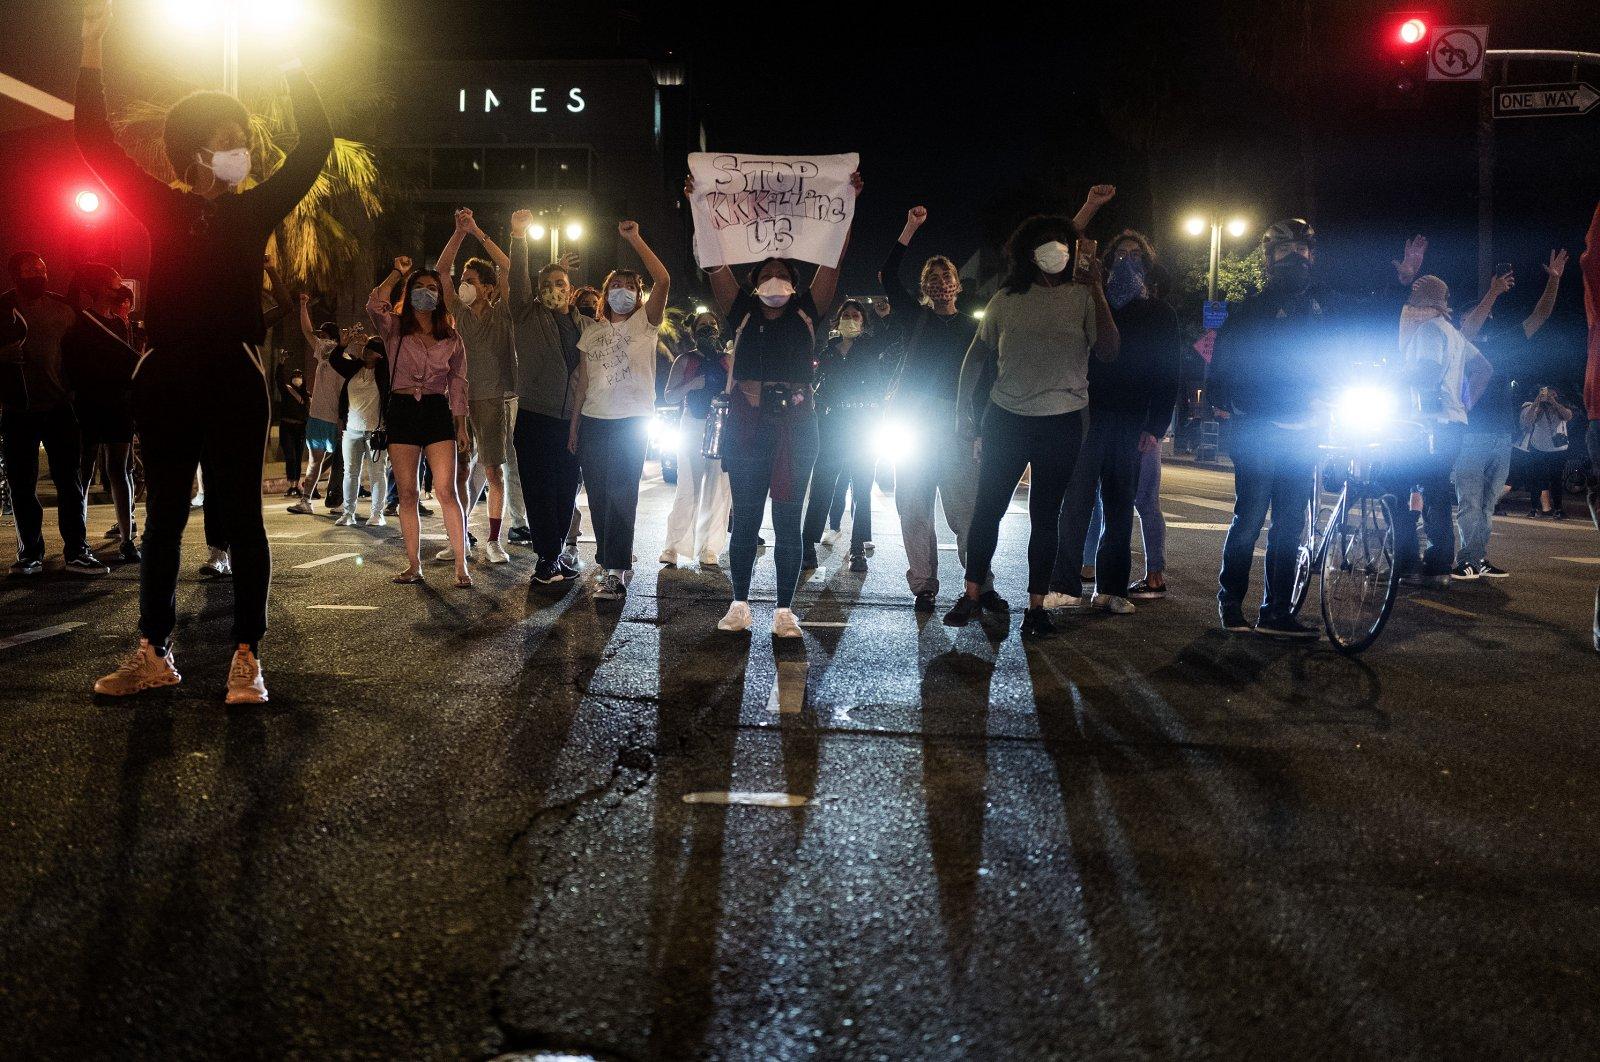 Demonstrators block traffic during a protest over the death of George Floyd in Minneapolis police custody earlier in the week, May 27, 2020, in Los Angeles. (AP Photo)